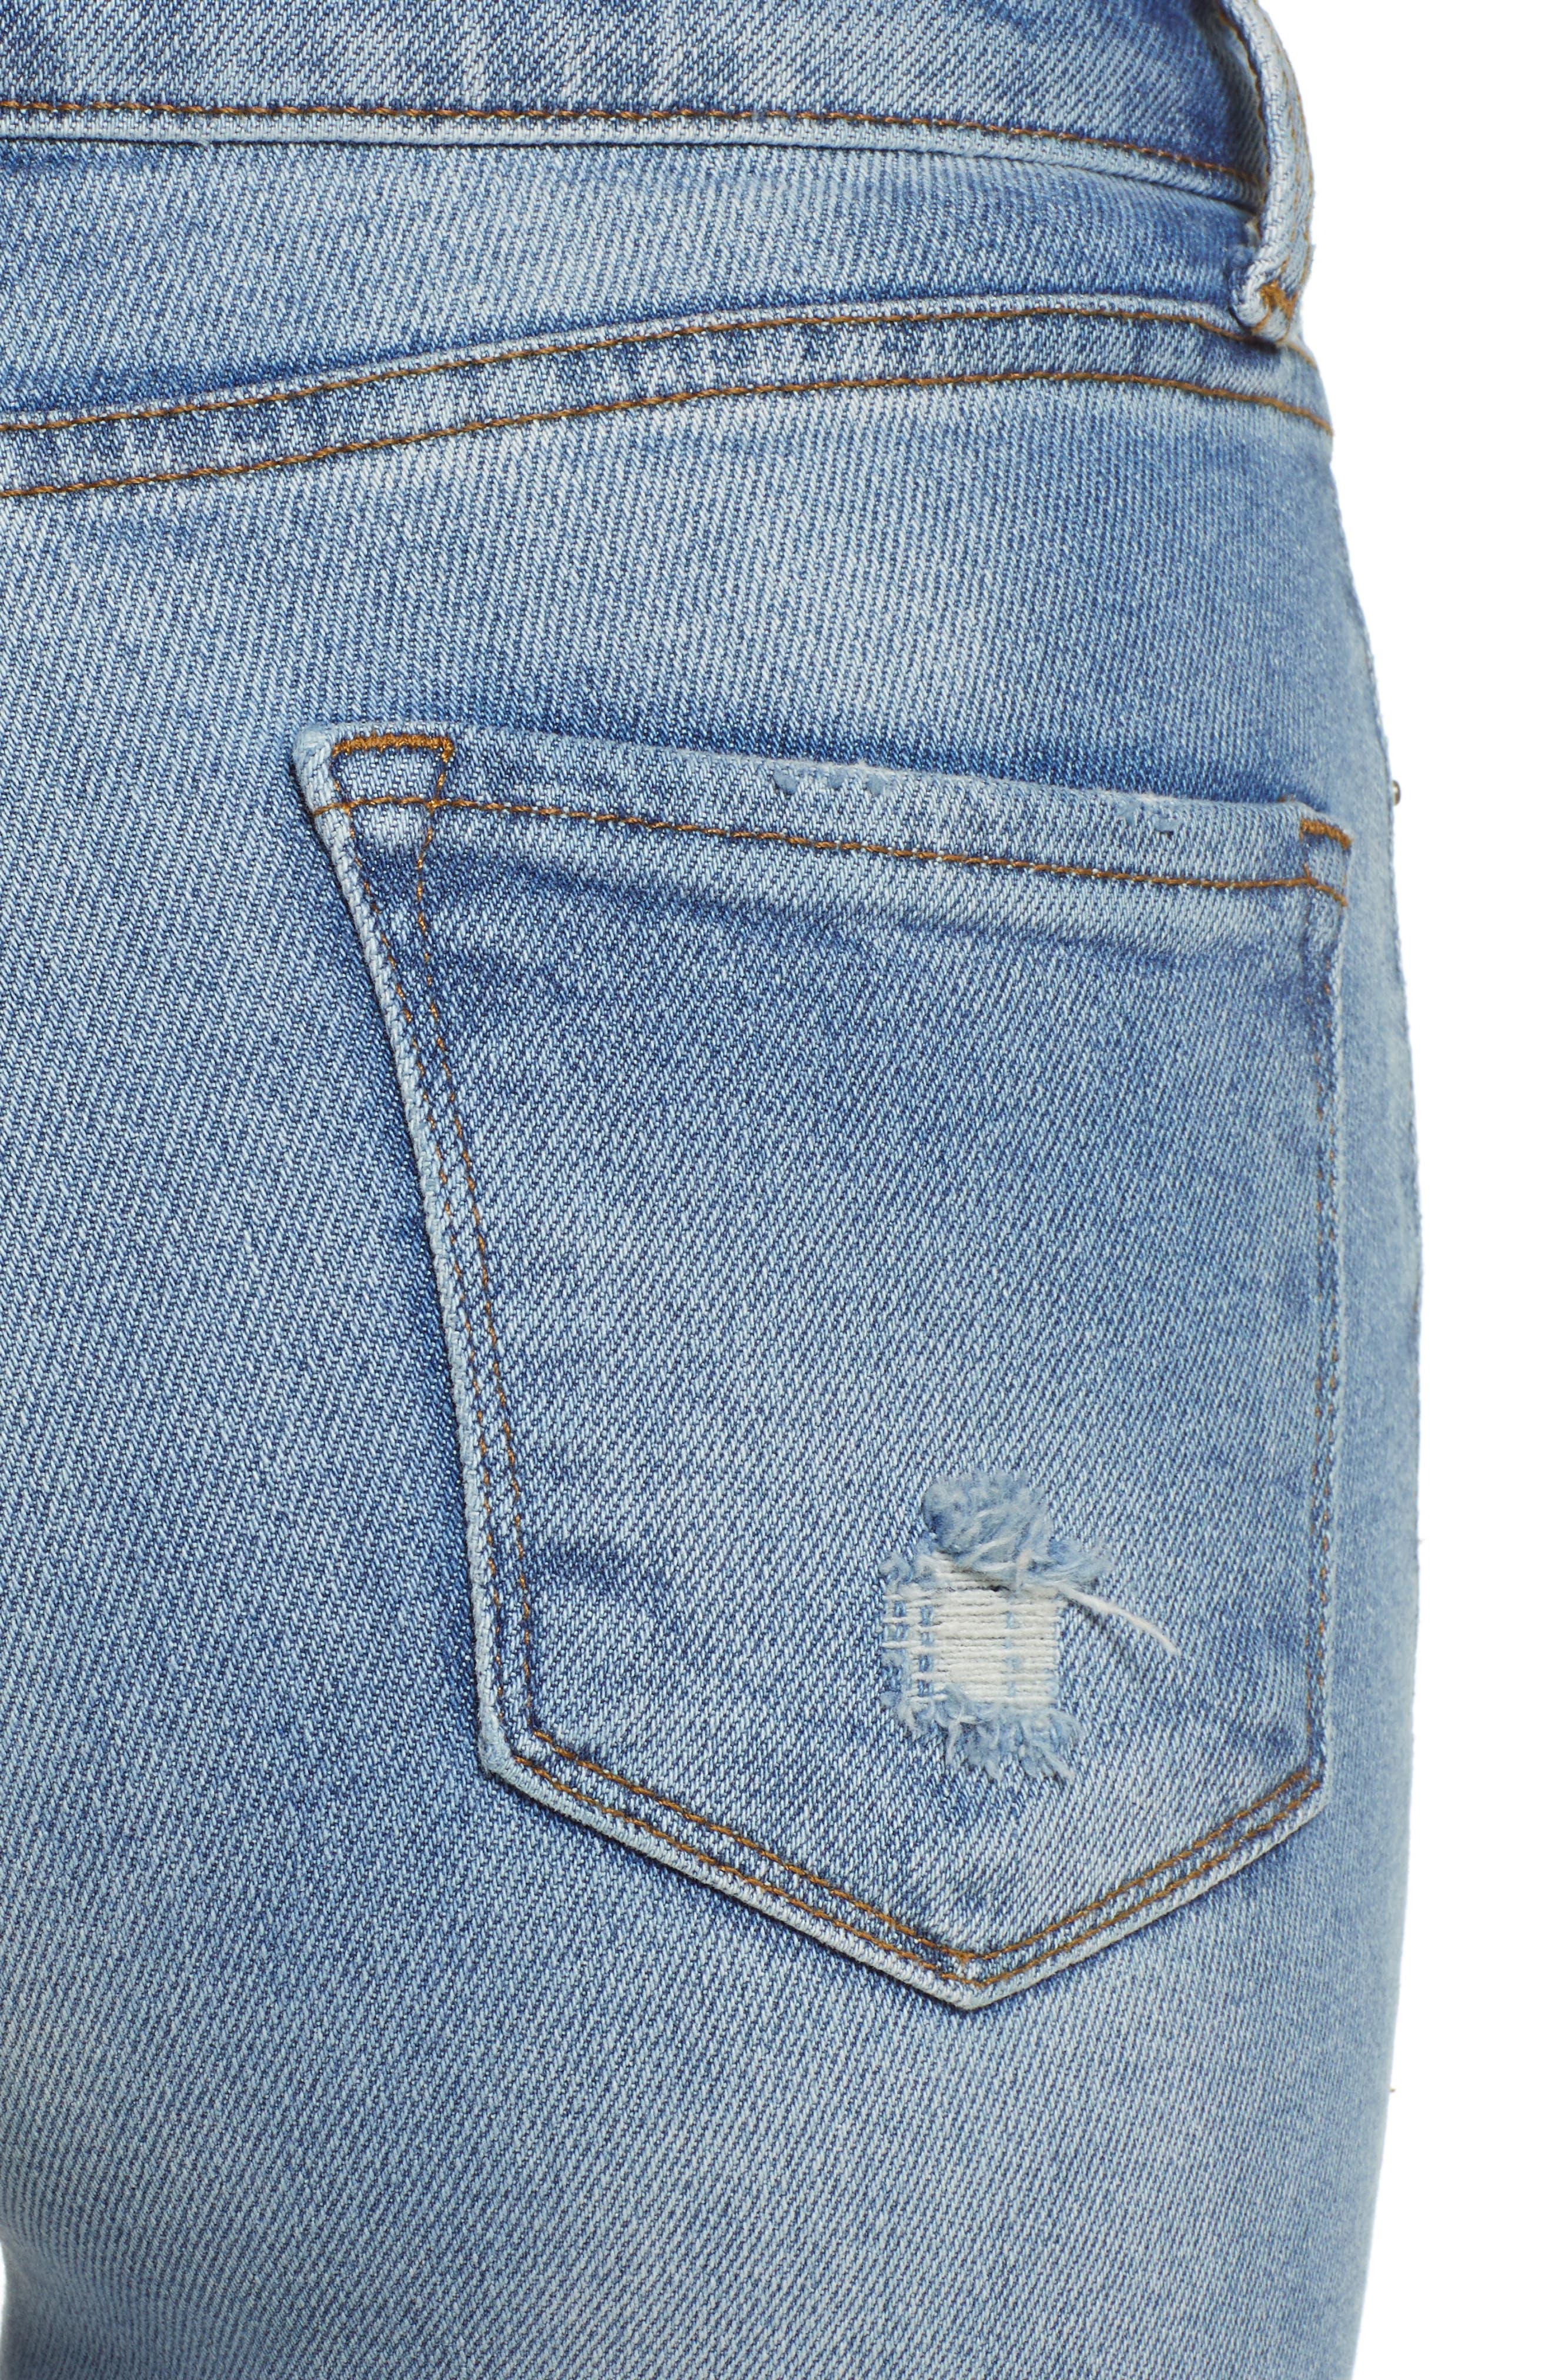 Brie High Waist Ripped Skinny Jeans,                             Alternate thumbnail 4, color,                             BRADFORD LIGHT WASH